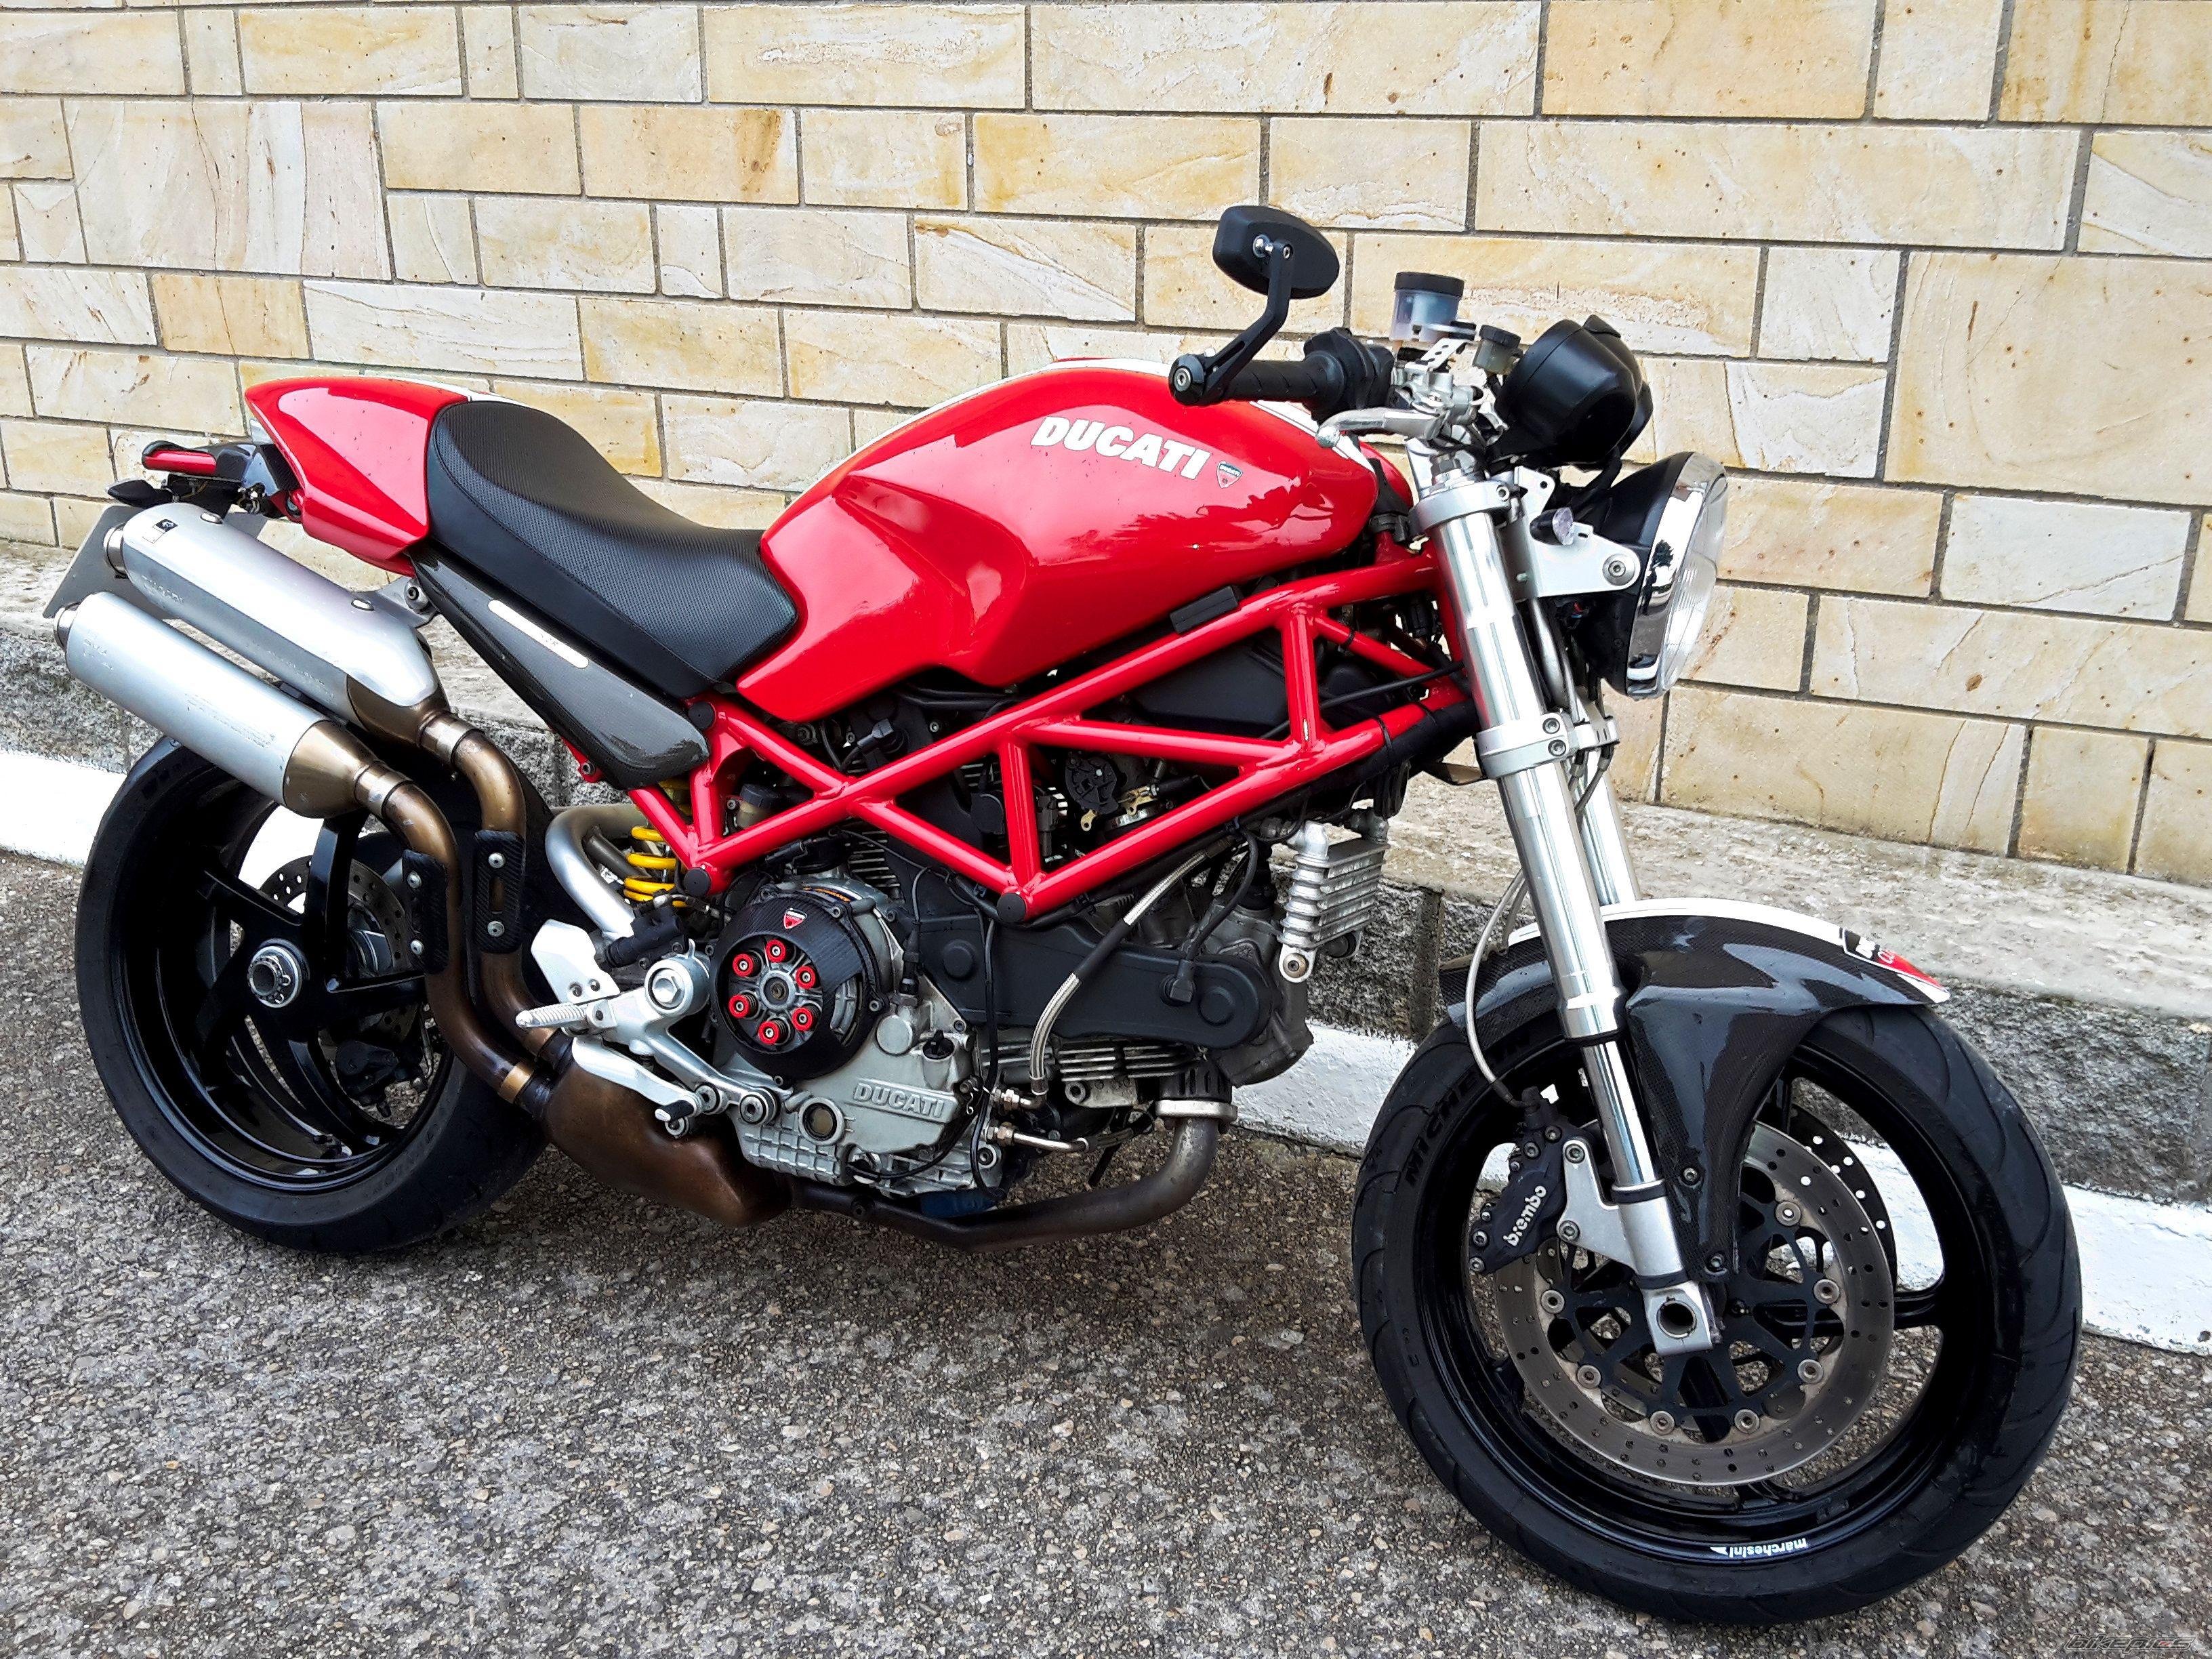 S2R1000 glamour shot : Ducati